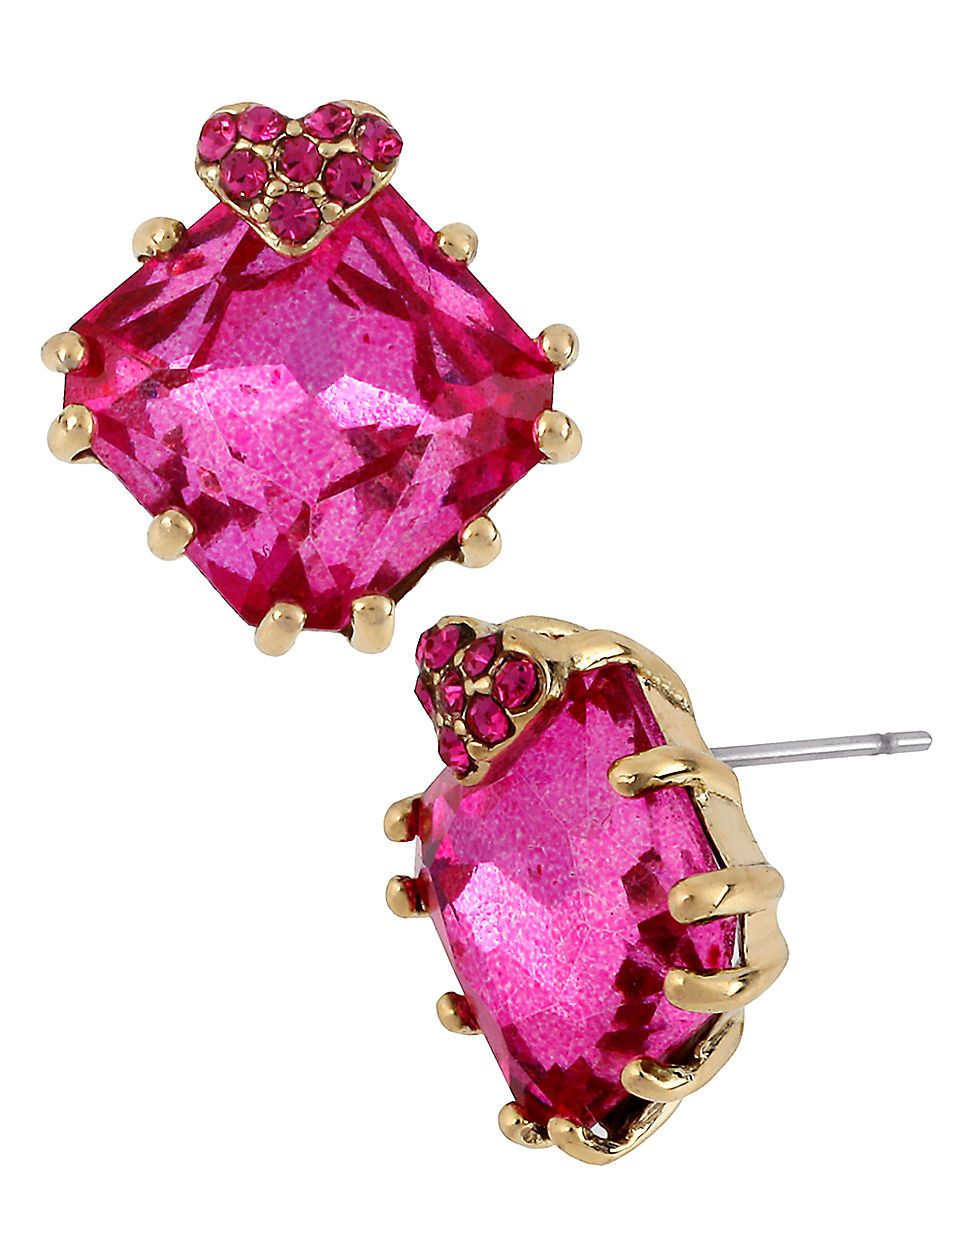 Jewellery & Accessories | Earrings | Square Fuchsia Gem Stud Earring | Hudson's Bay